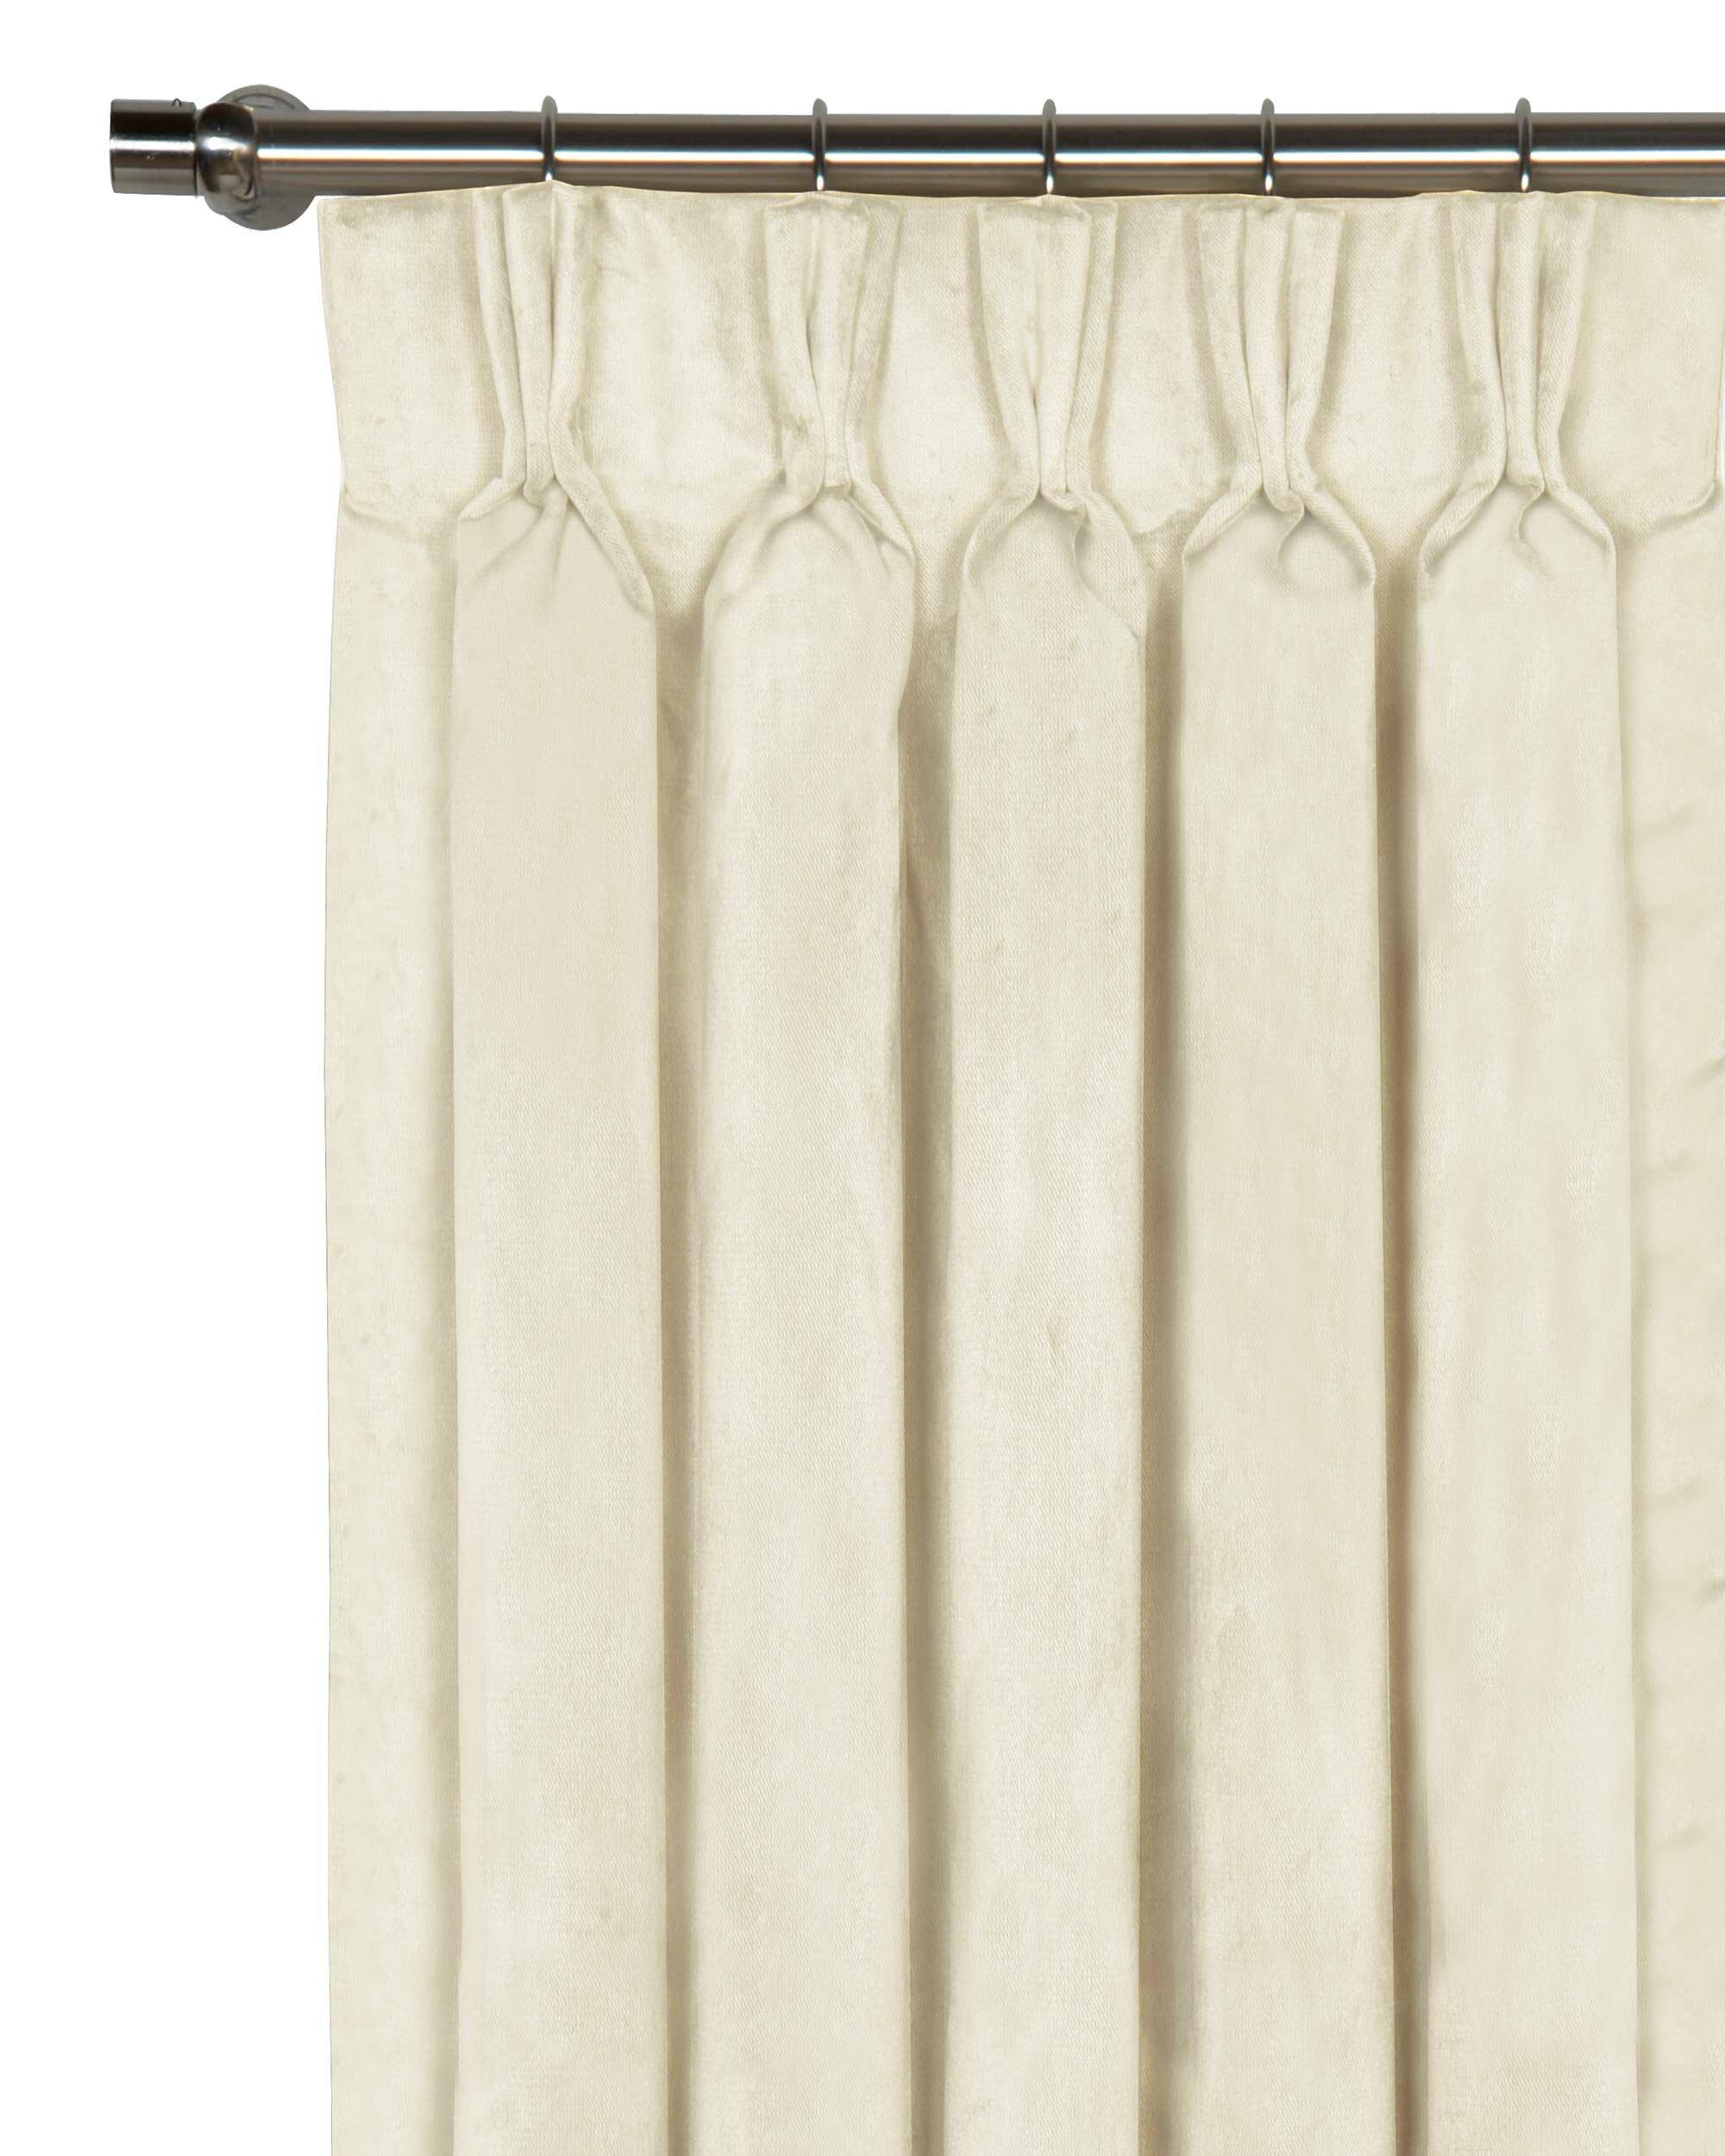 Eastern Accents Nellis Velvet Solid Room Darkening Pinch Pleat Single Curtain Panel Wayfair